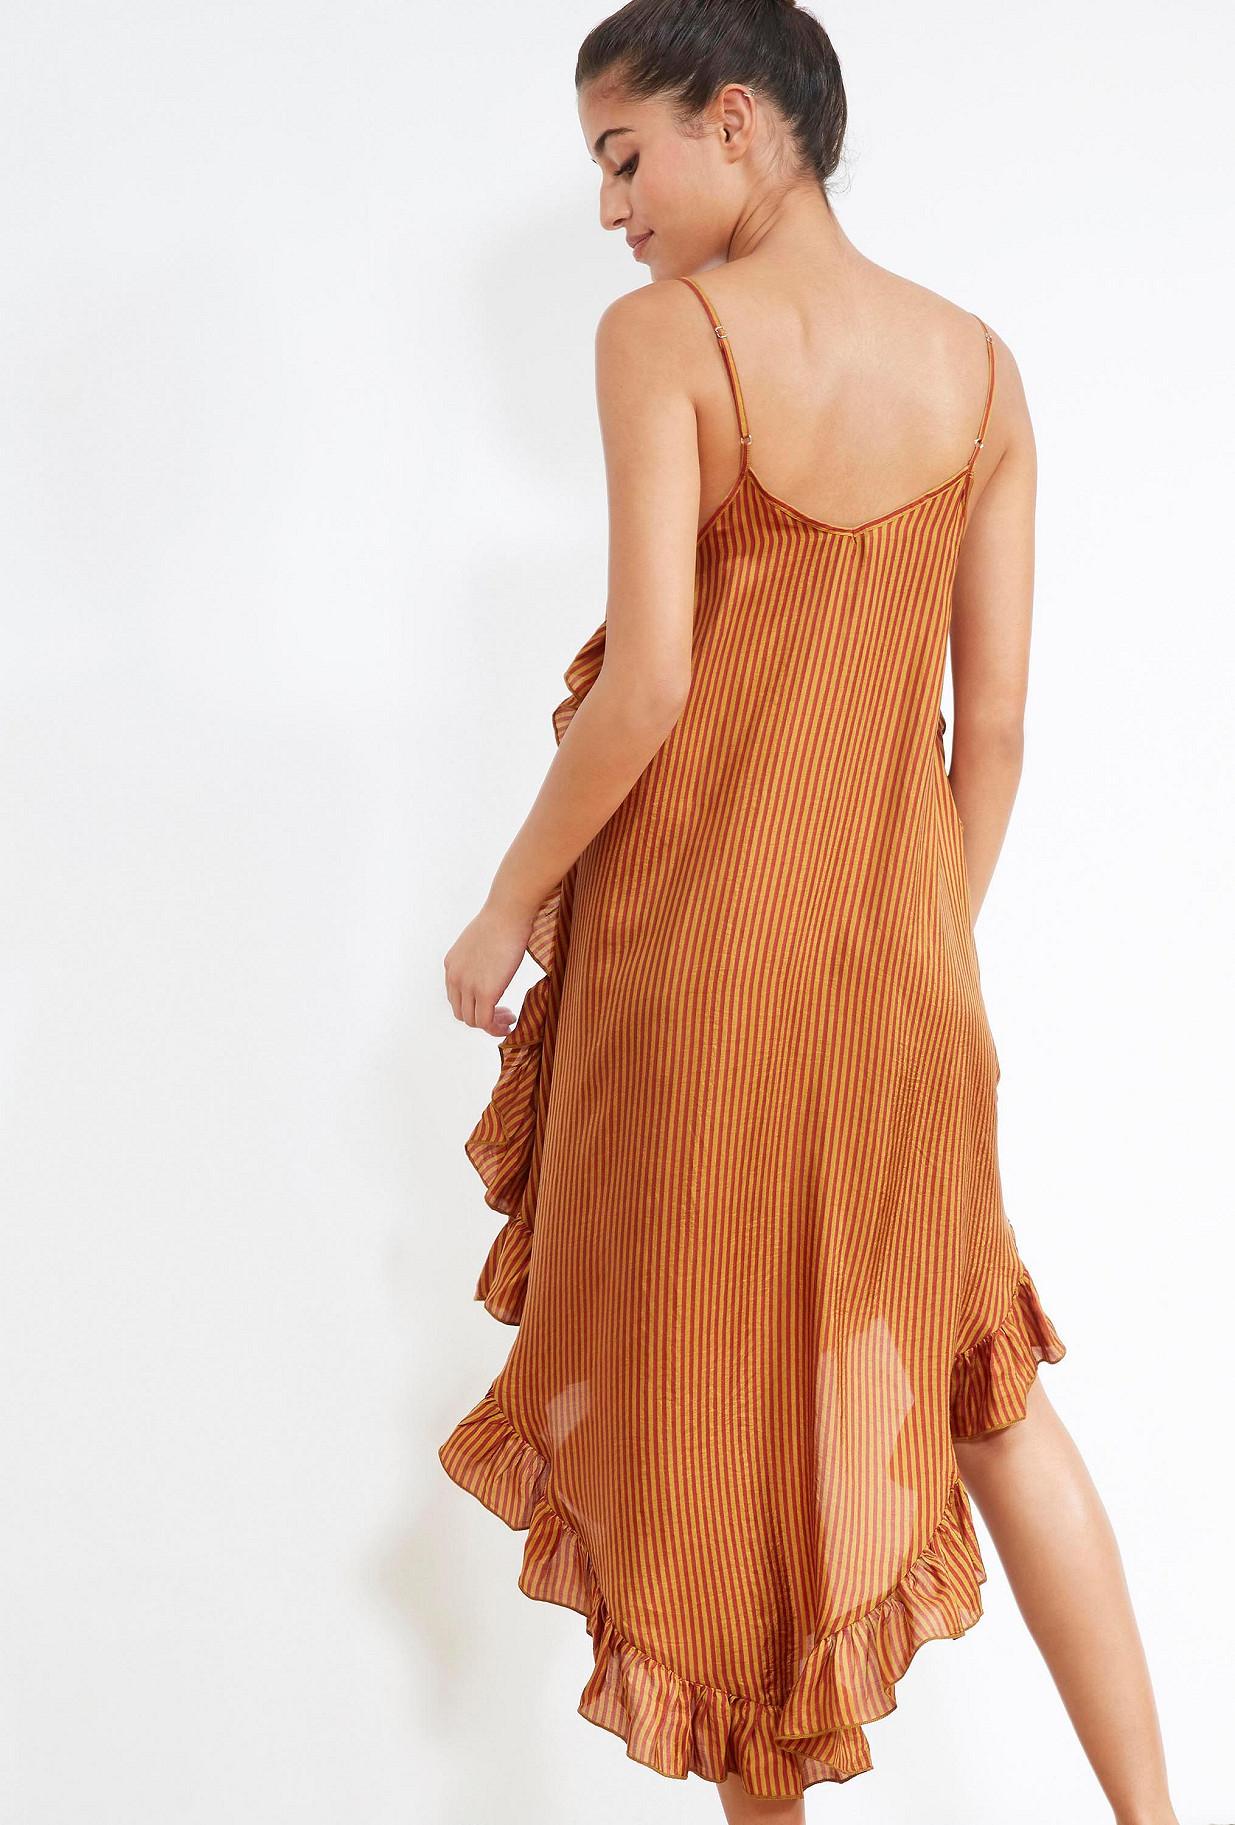 clothes store DRESS  Chicoree french designer fashion Paris